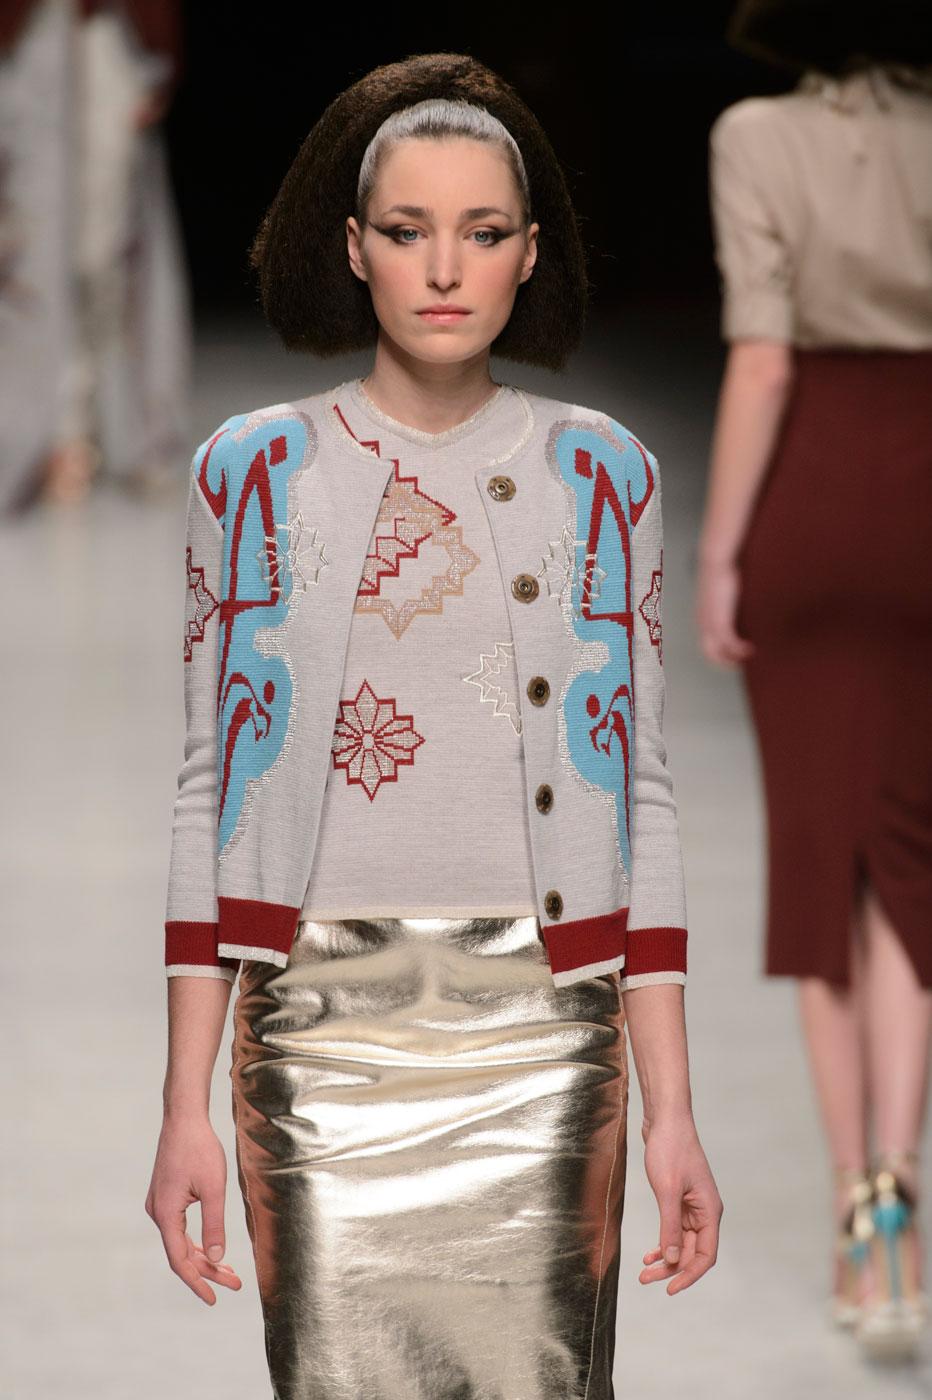 Julien-Fournie-Prive-fashion-runway-show-haute-couture-paris-spring-2015-the-impression-09